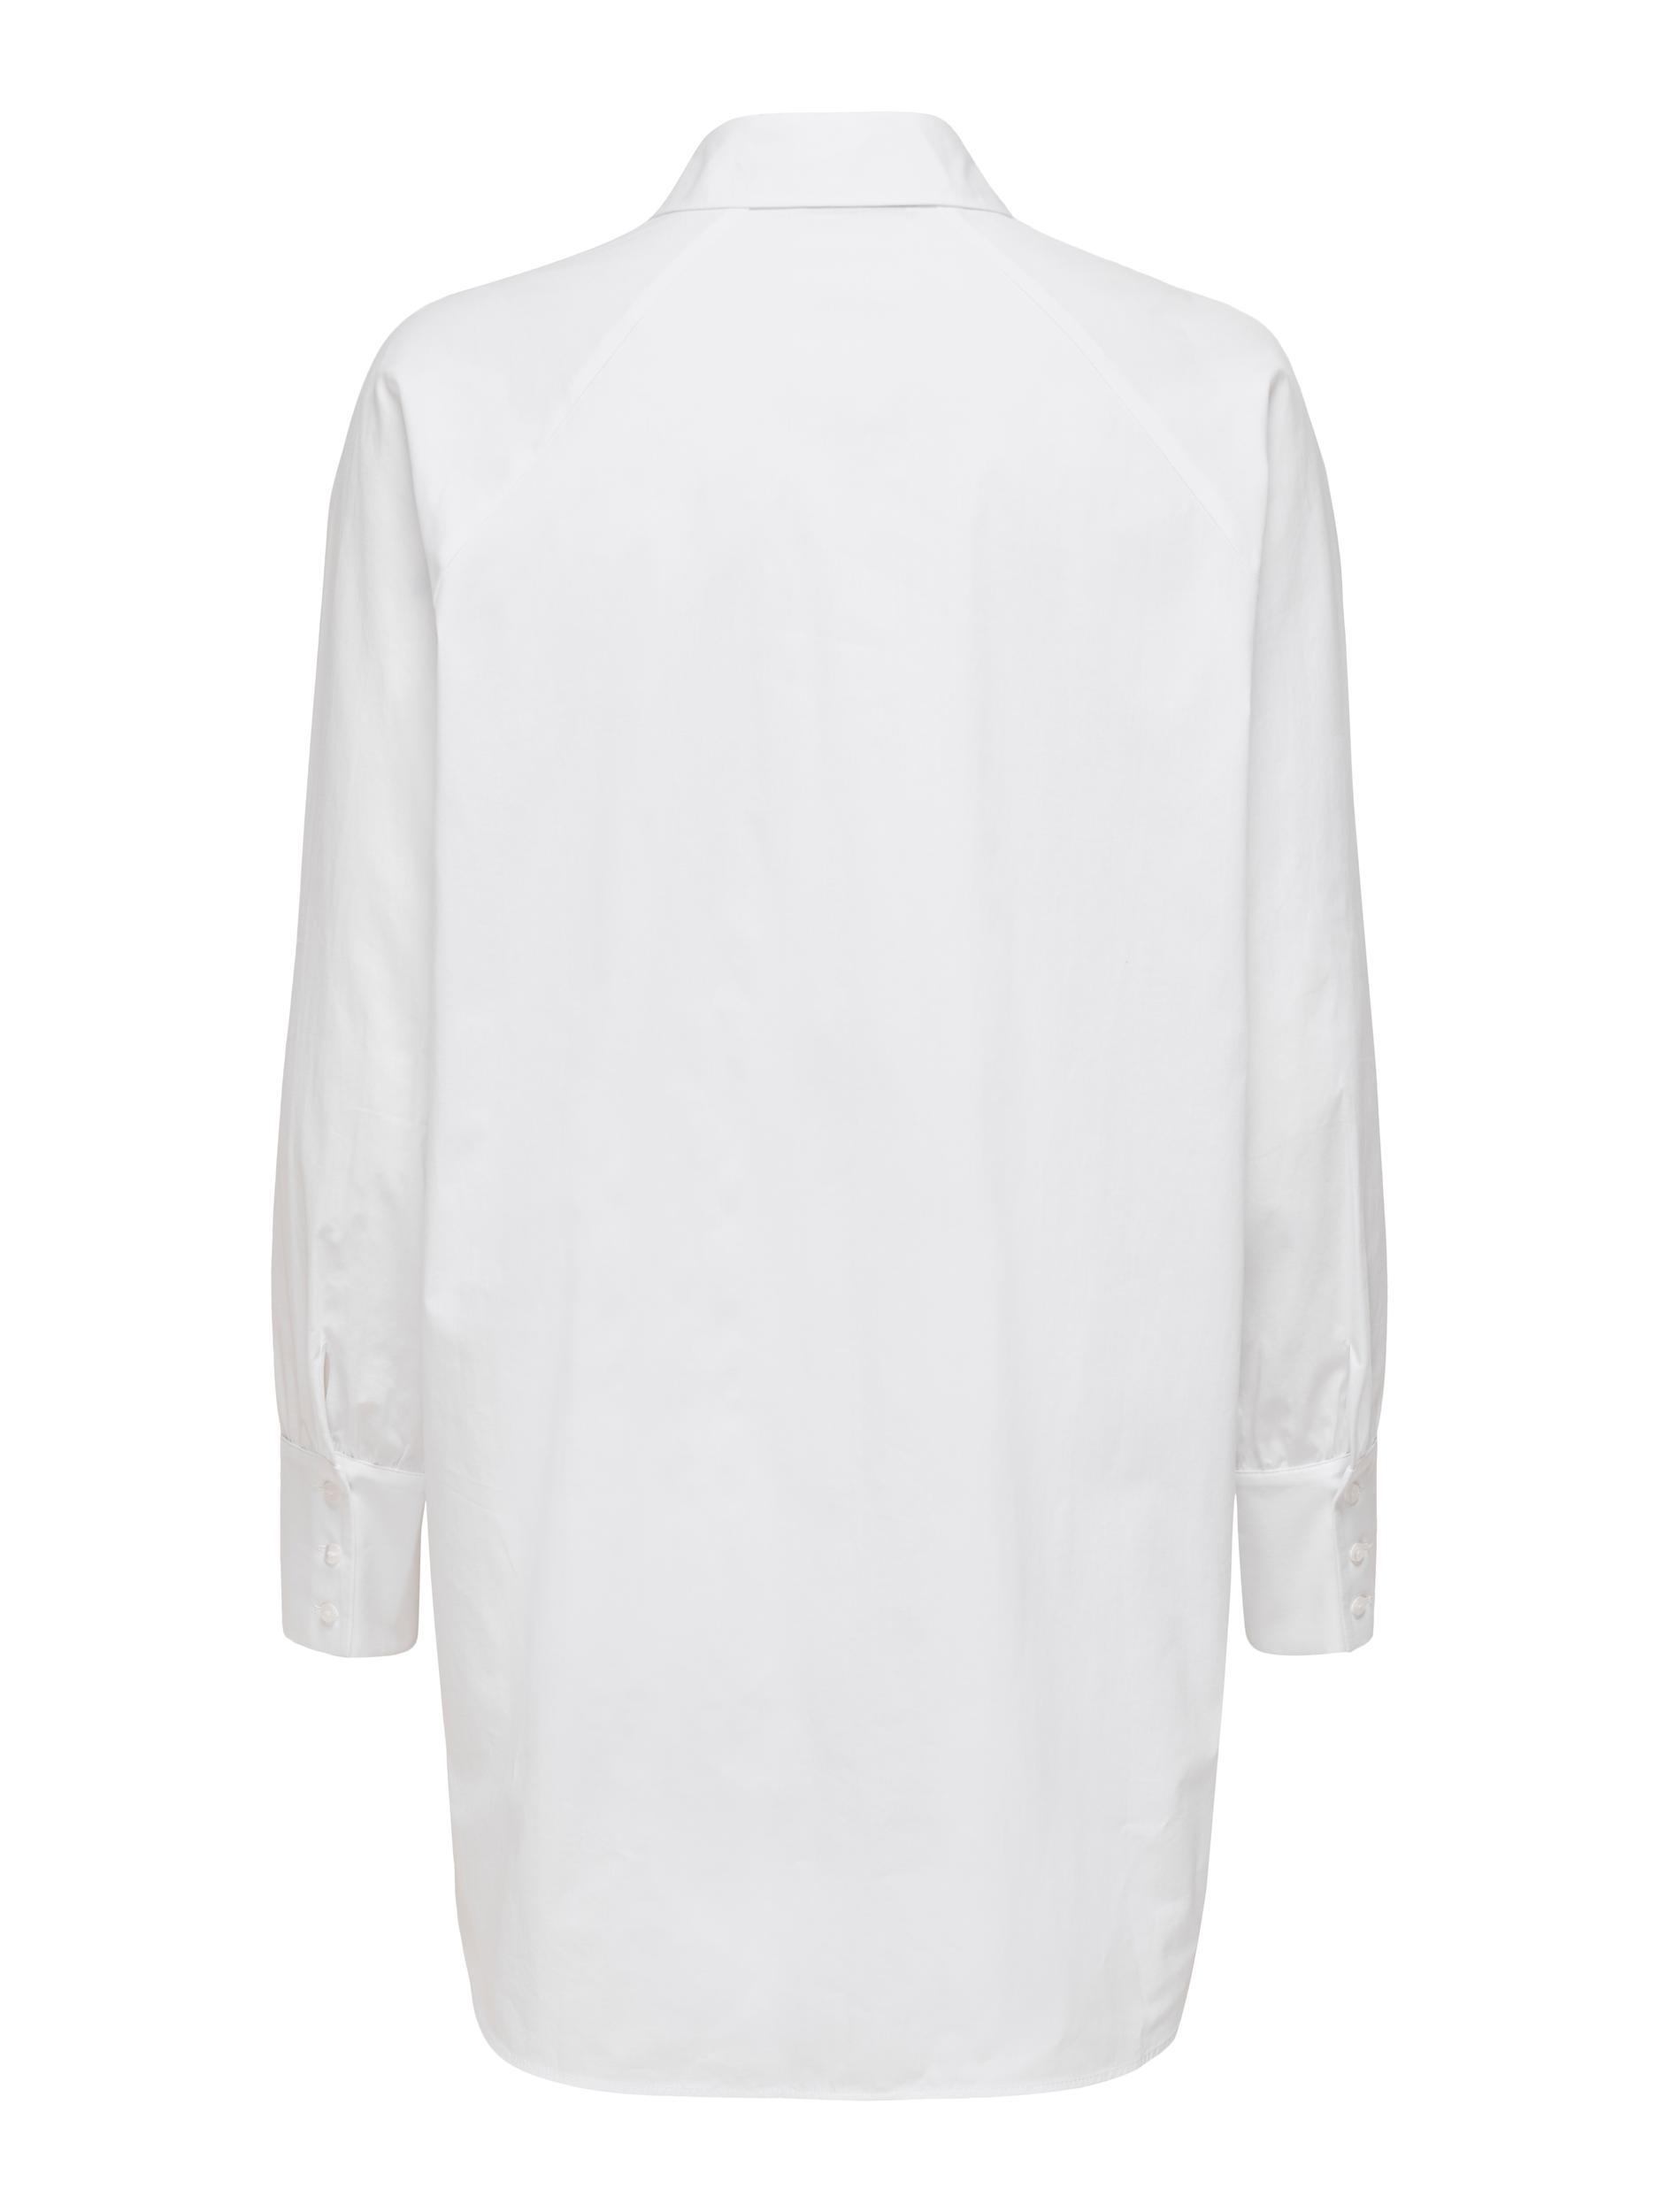 Only Kat lang skjorte, white, x-small